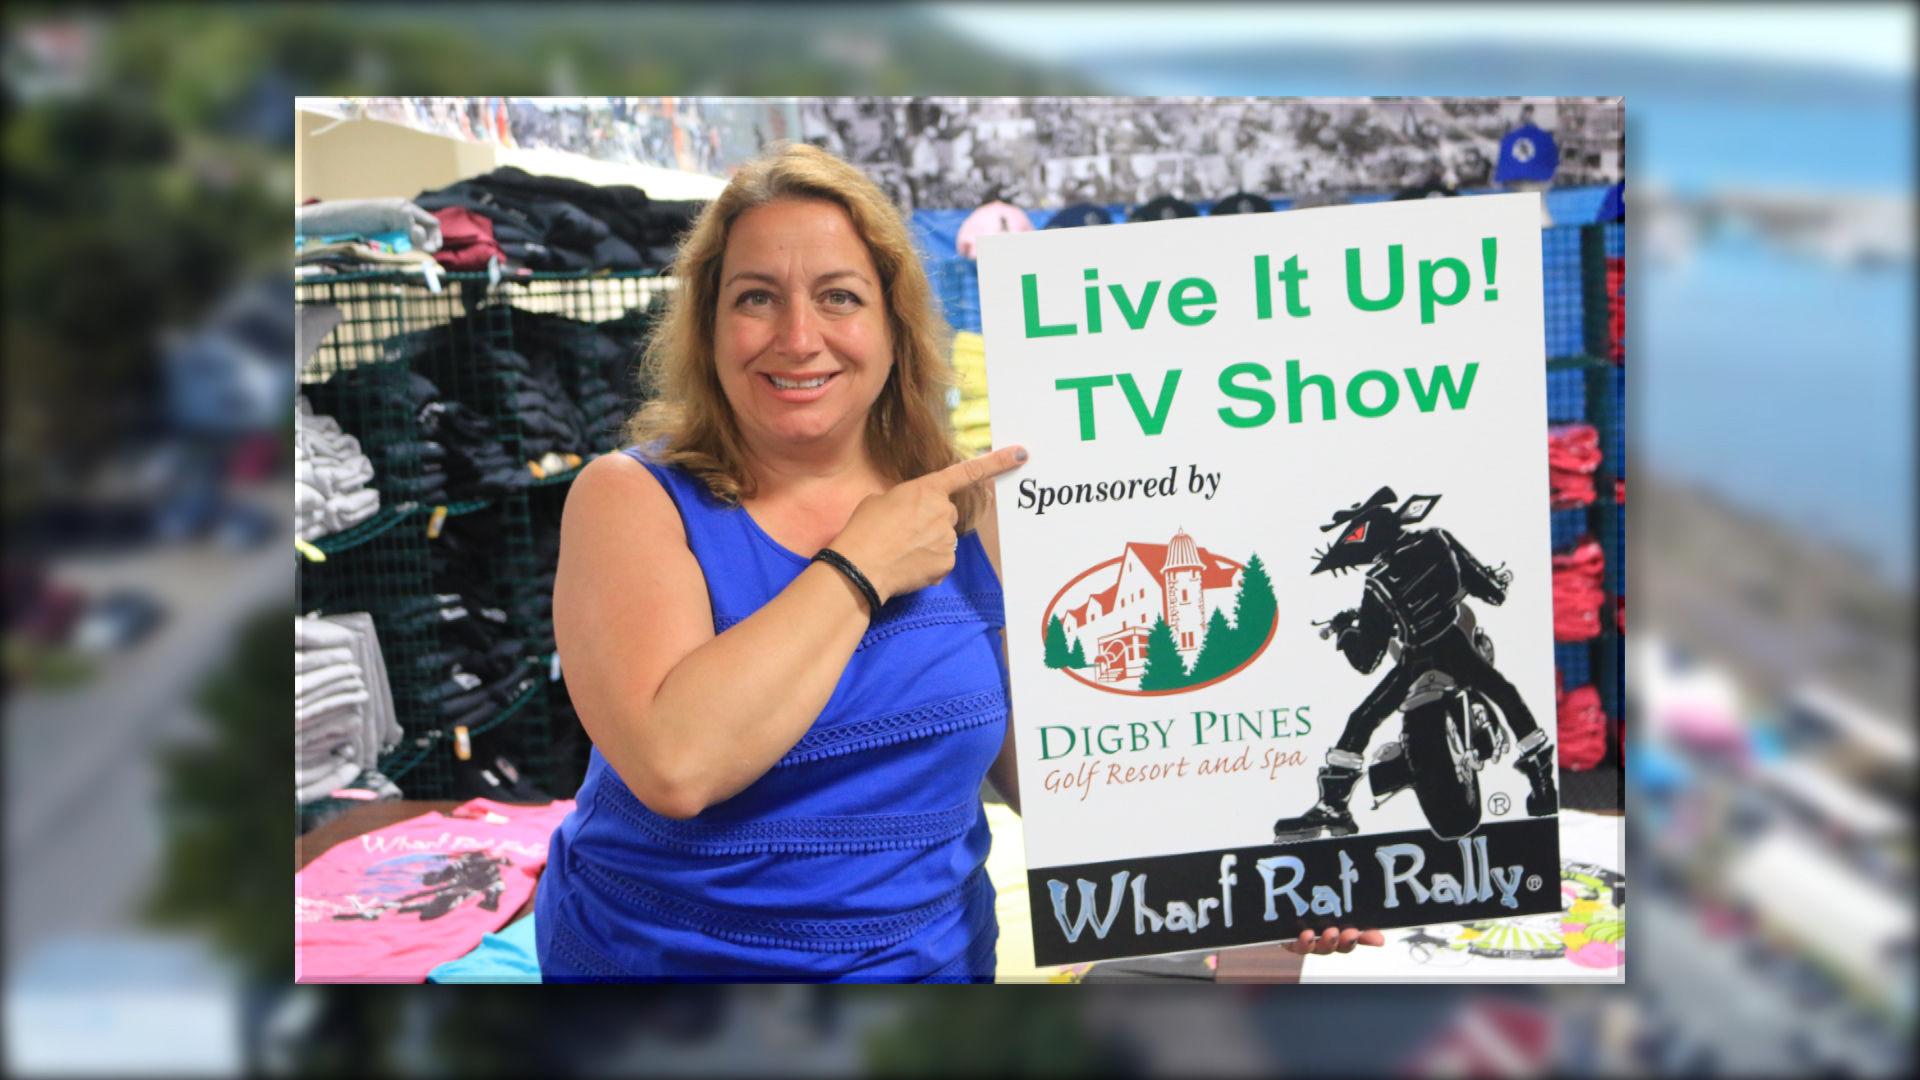 Nova Scotia Travel Special: The Wharf Rat Rally Music Video!